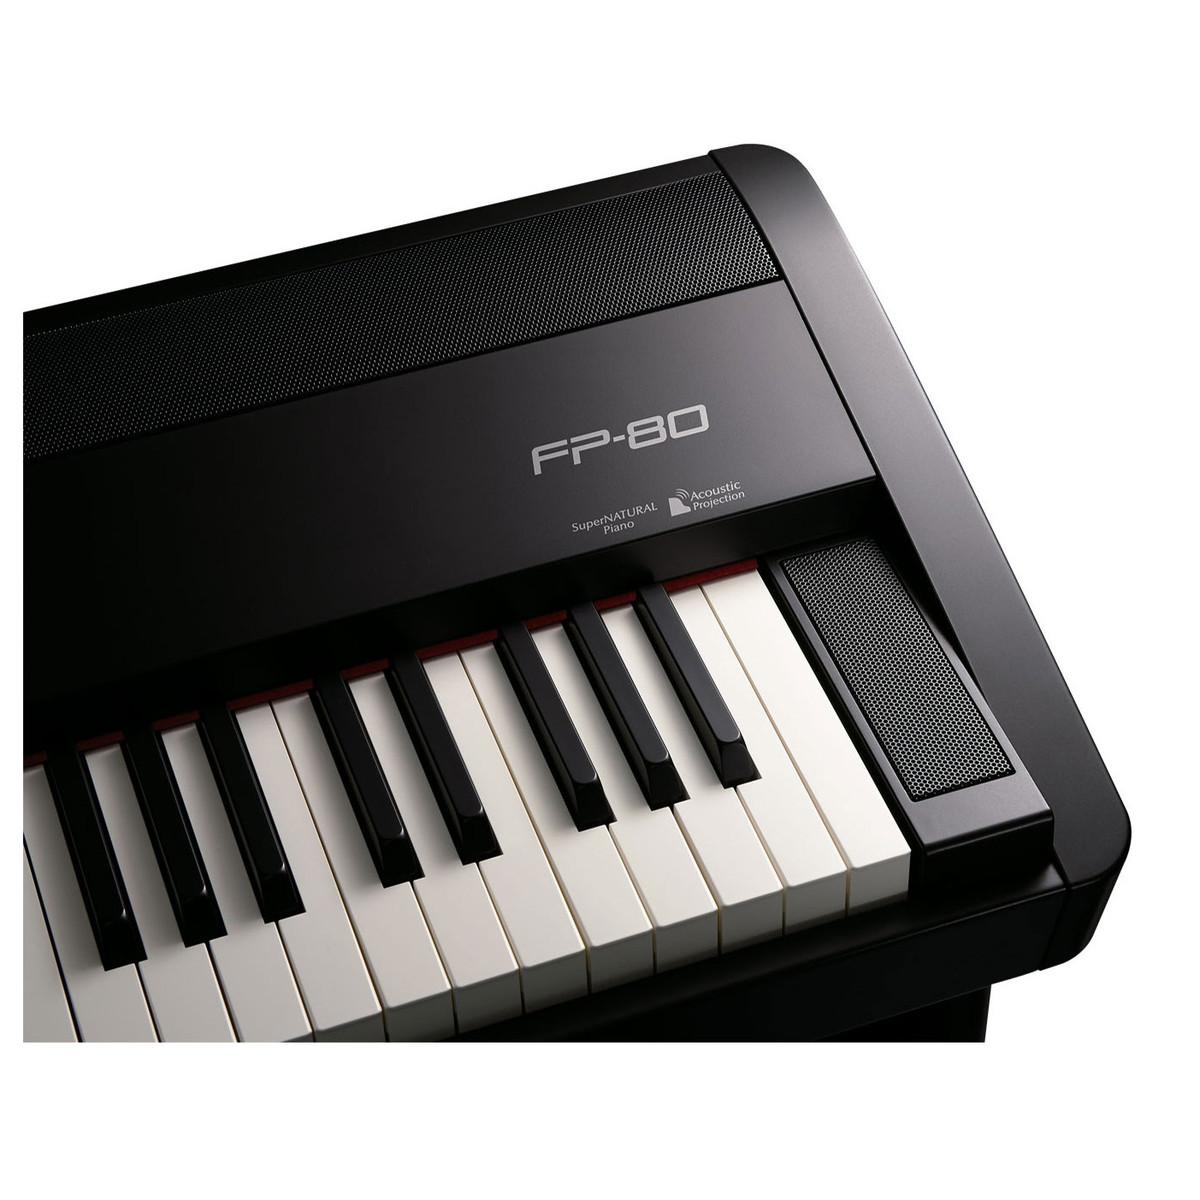 roland fp 80 supernatural digital piano black box opened at. Black Bedroom Furniture Sets. Home Design Ideas